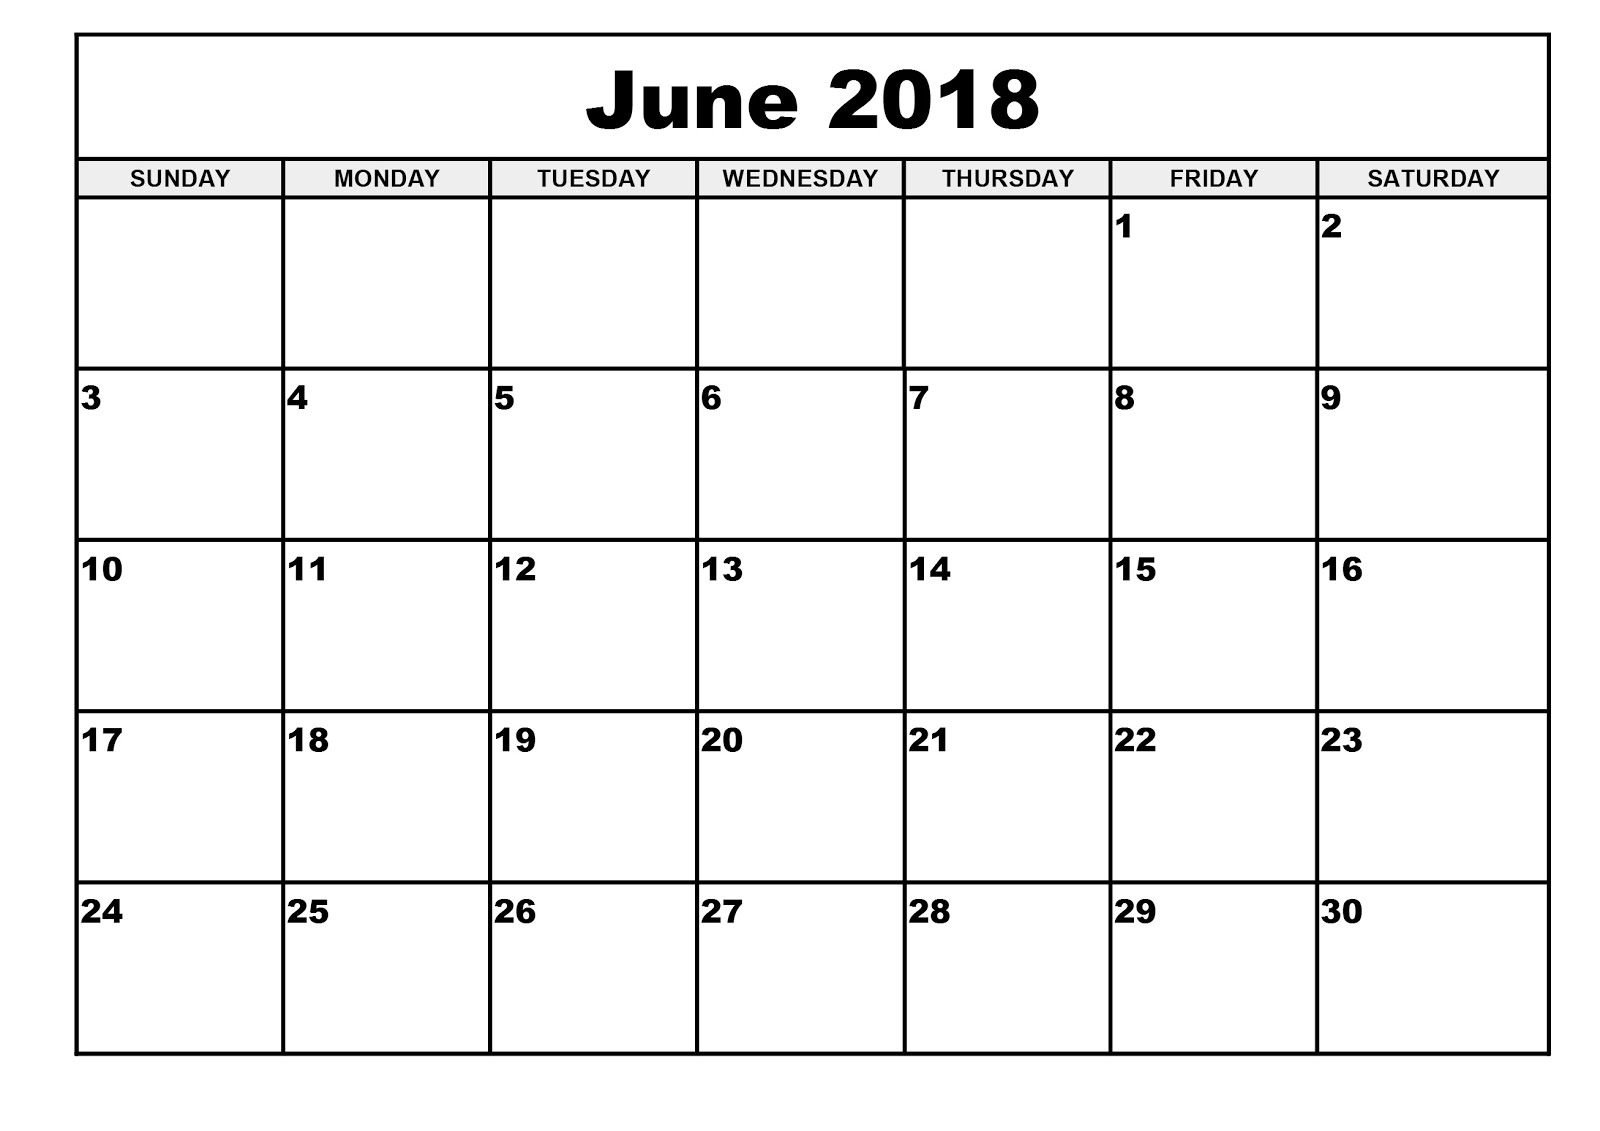 Download June 2018 Calendar Printable Templates - Webelator